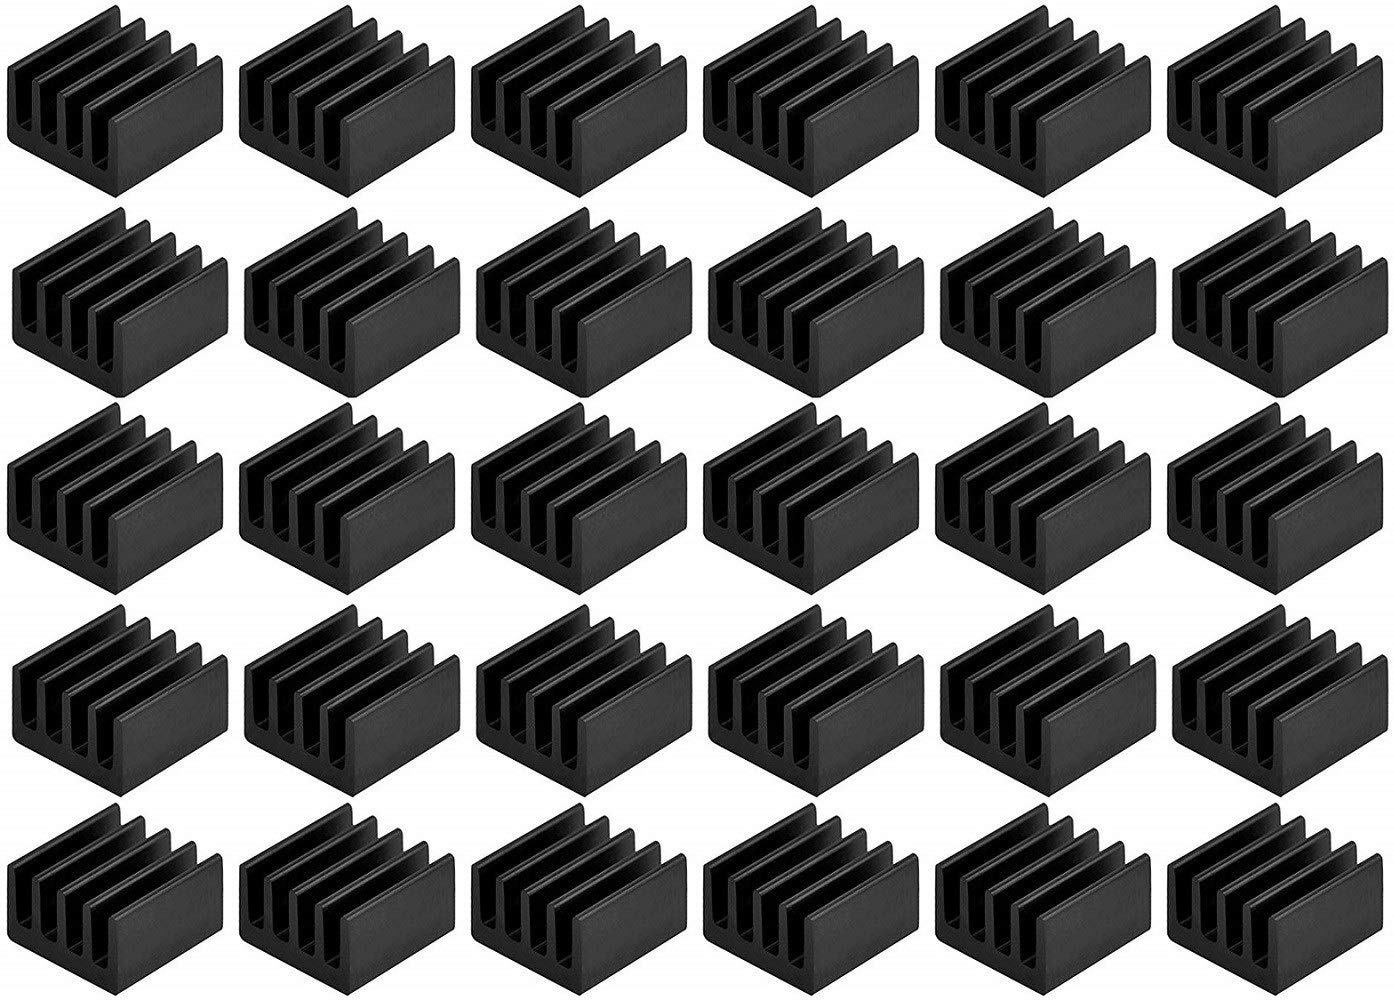 8.8mmx8.8mmx5mm Easycargo 30pcs Small Mini Heatsink Kit Mini Cooler Heat Sink for Cooling VRM Stepper Driver MOSFET VRam Regulators